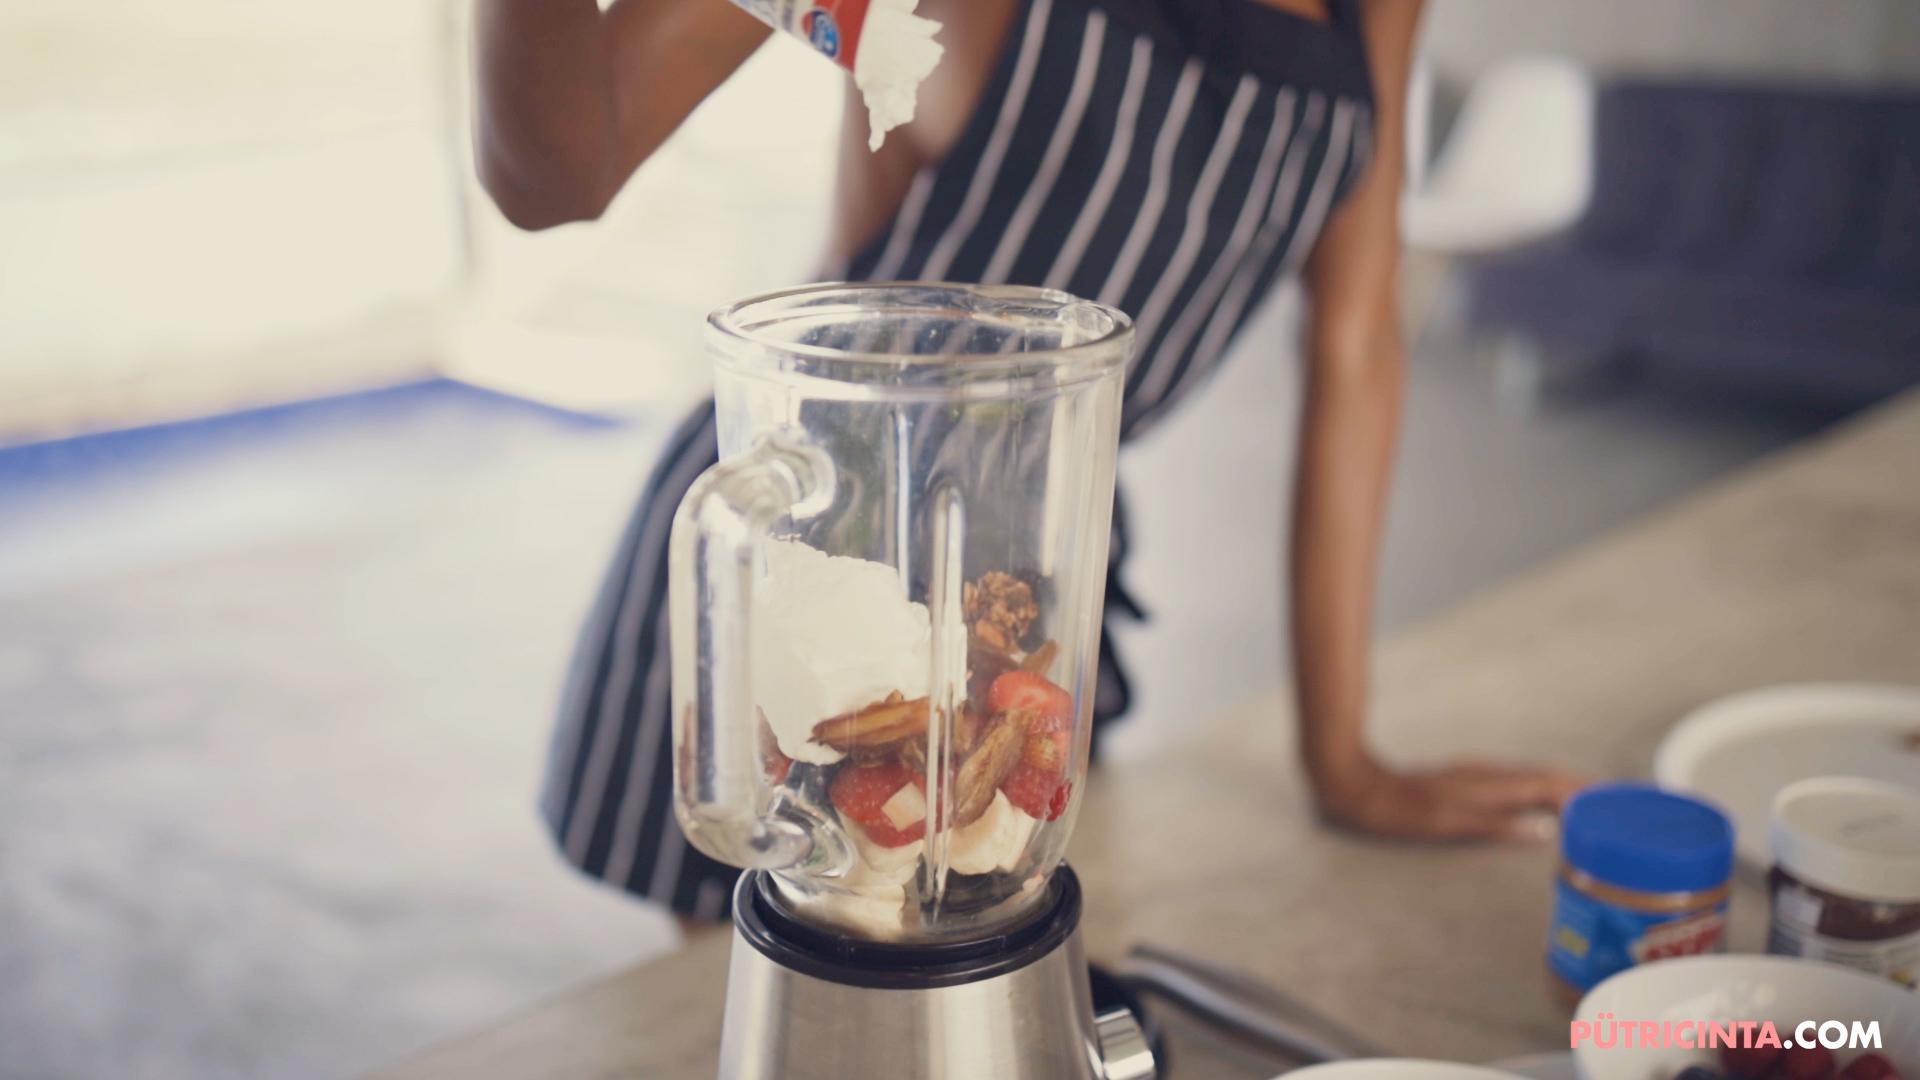 028-Putri-Cinta-Cooking-Class-mainvid-stills-26.jpg